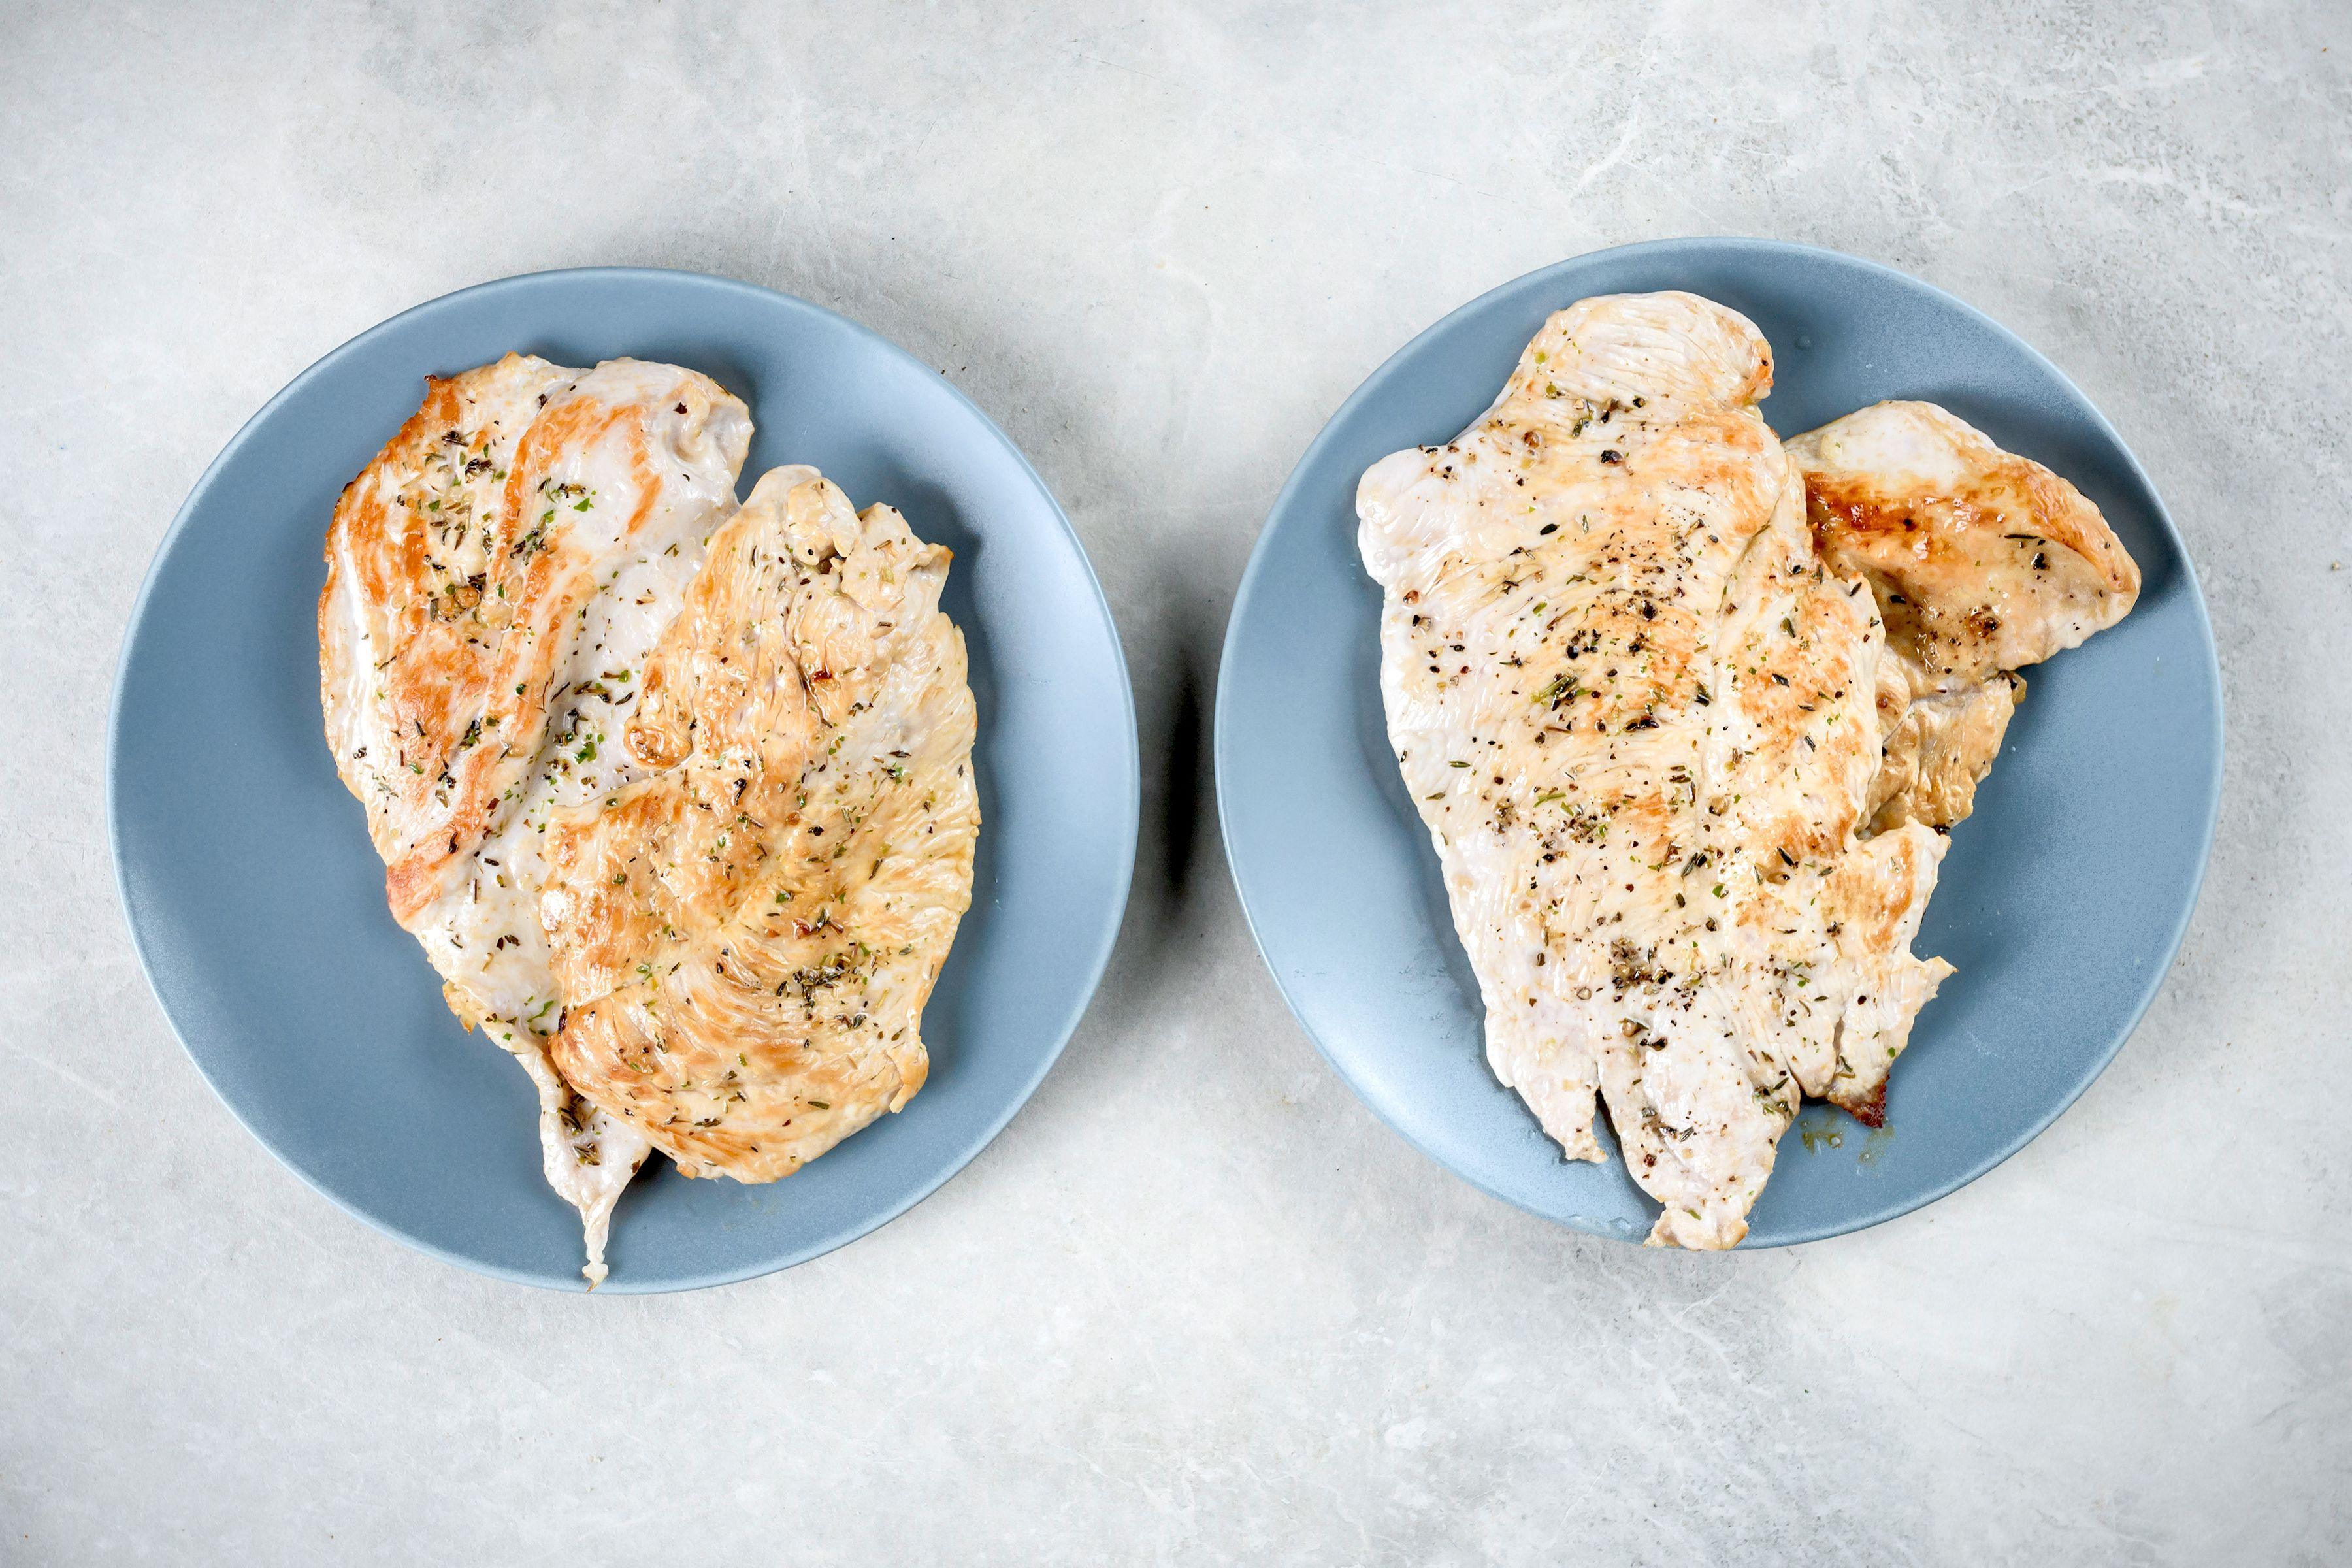 Seared turkey breasts on plates